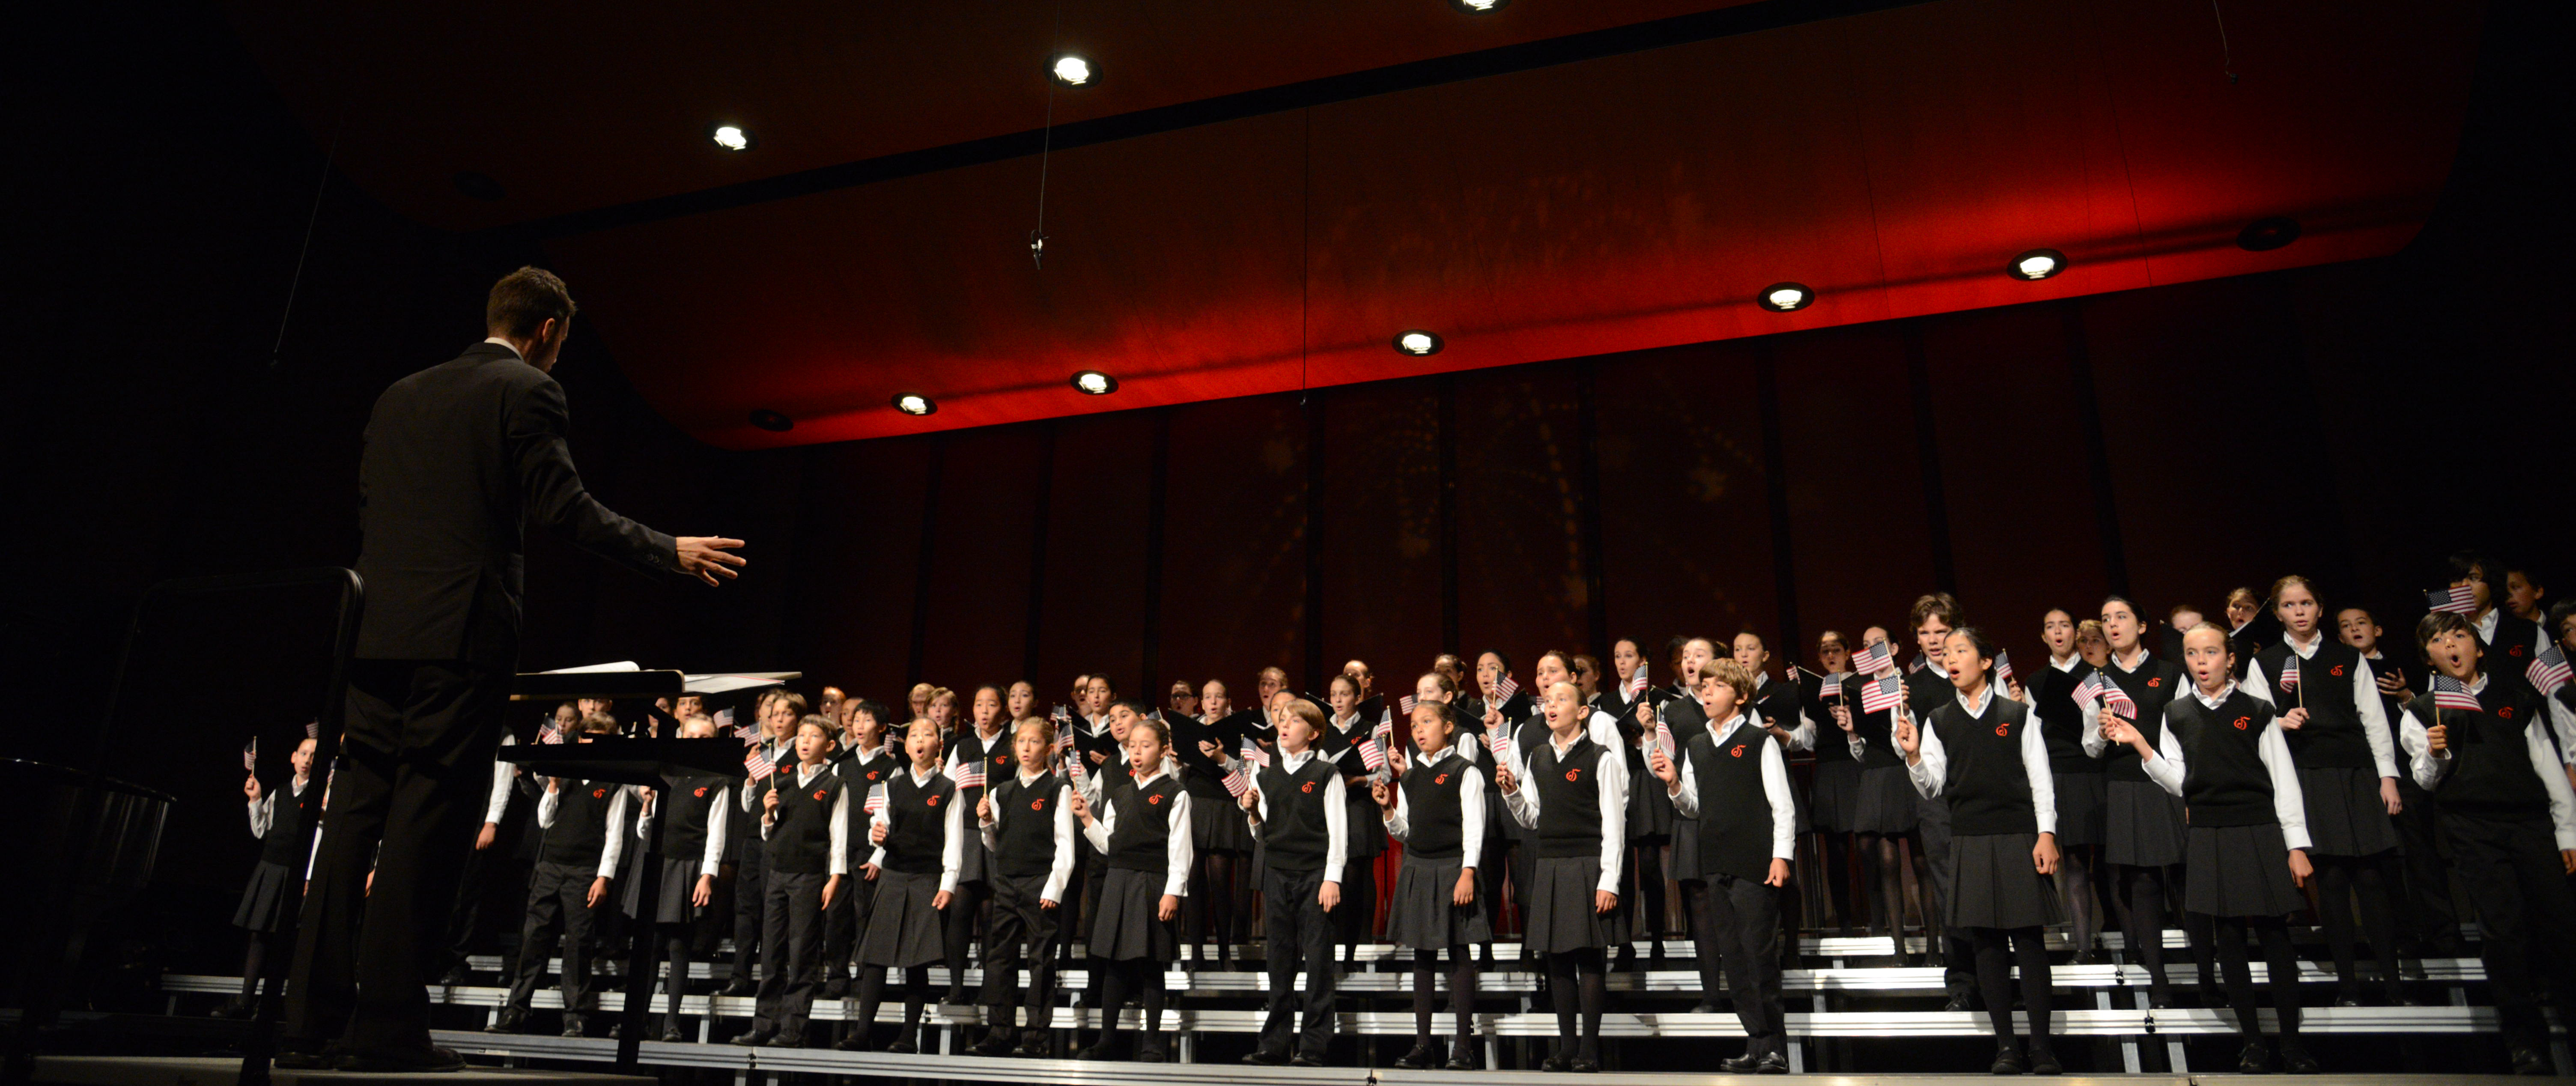 national childrens choir performance - HD6016×2536